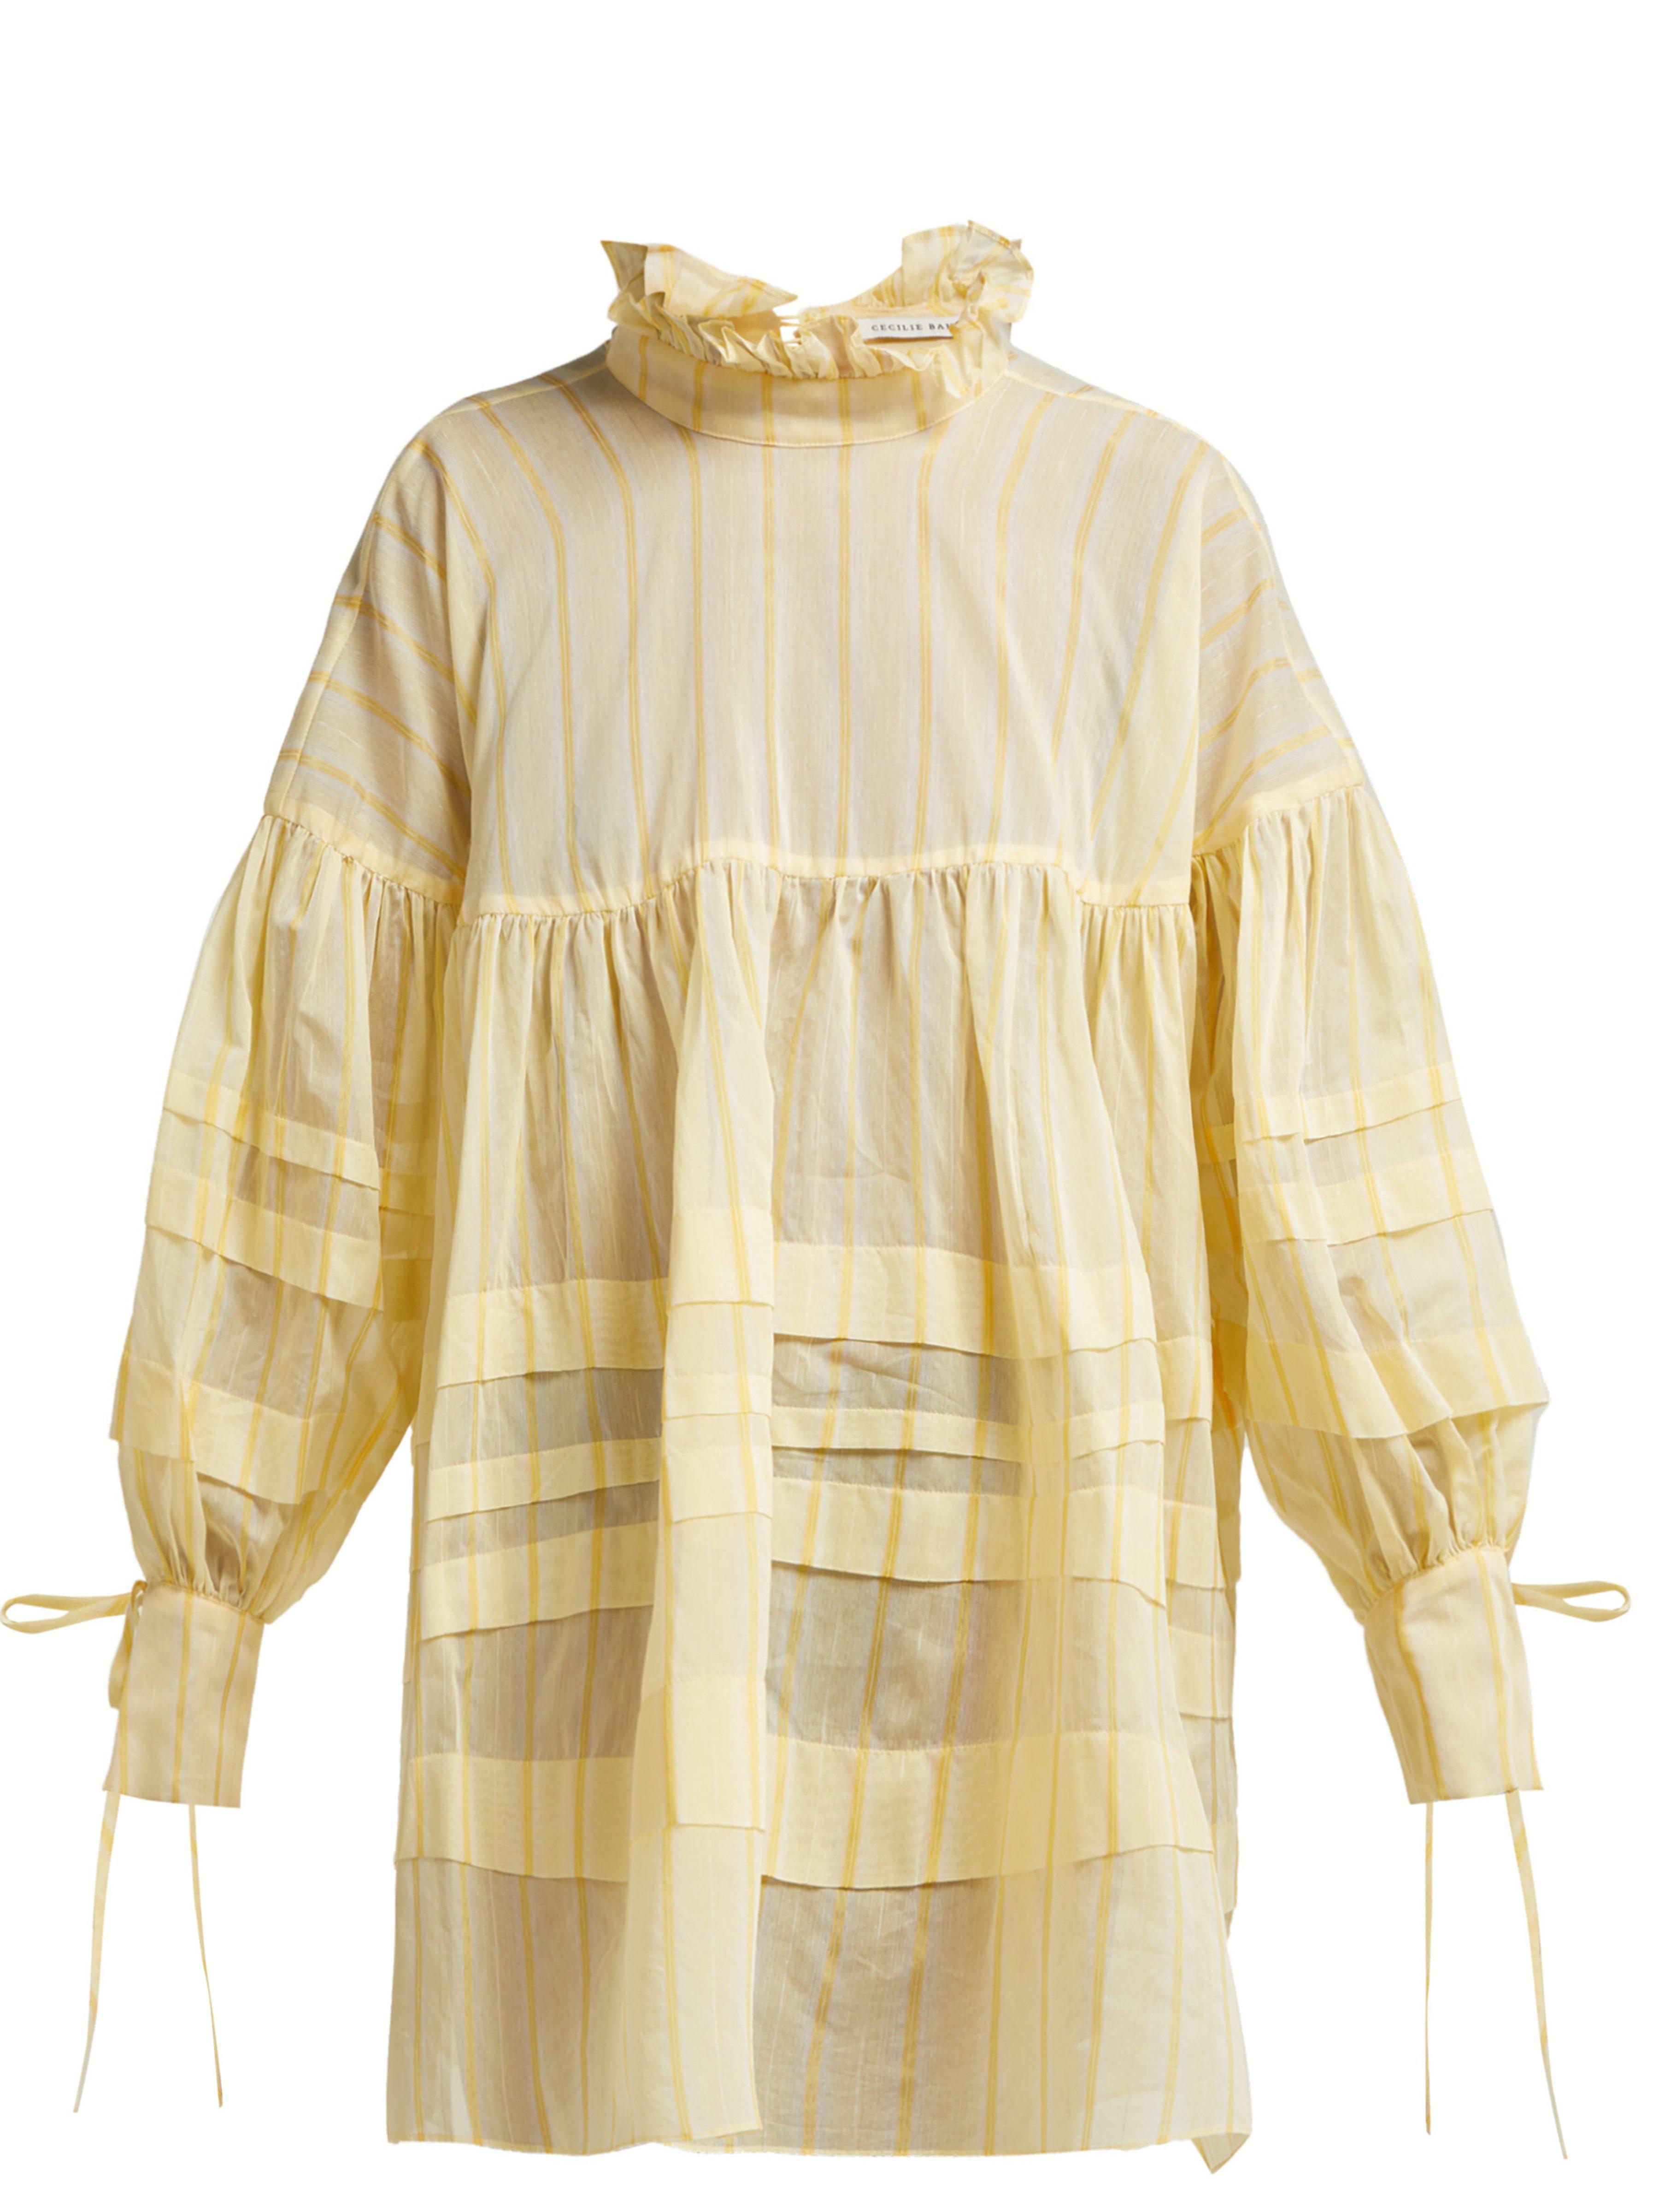 Cotton Cecile Yellow Lyst Dress Blend Bahnsen Alberte In 1JlKTFc